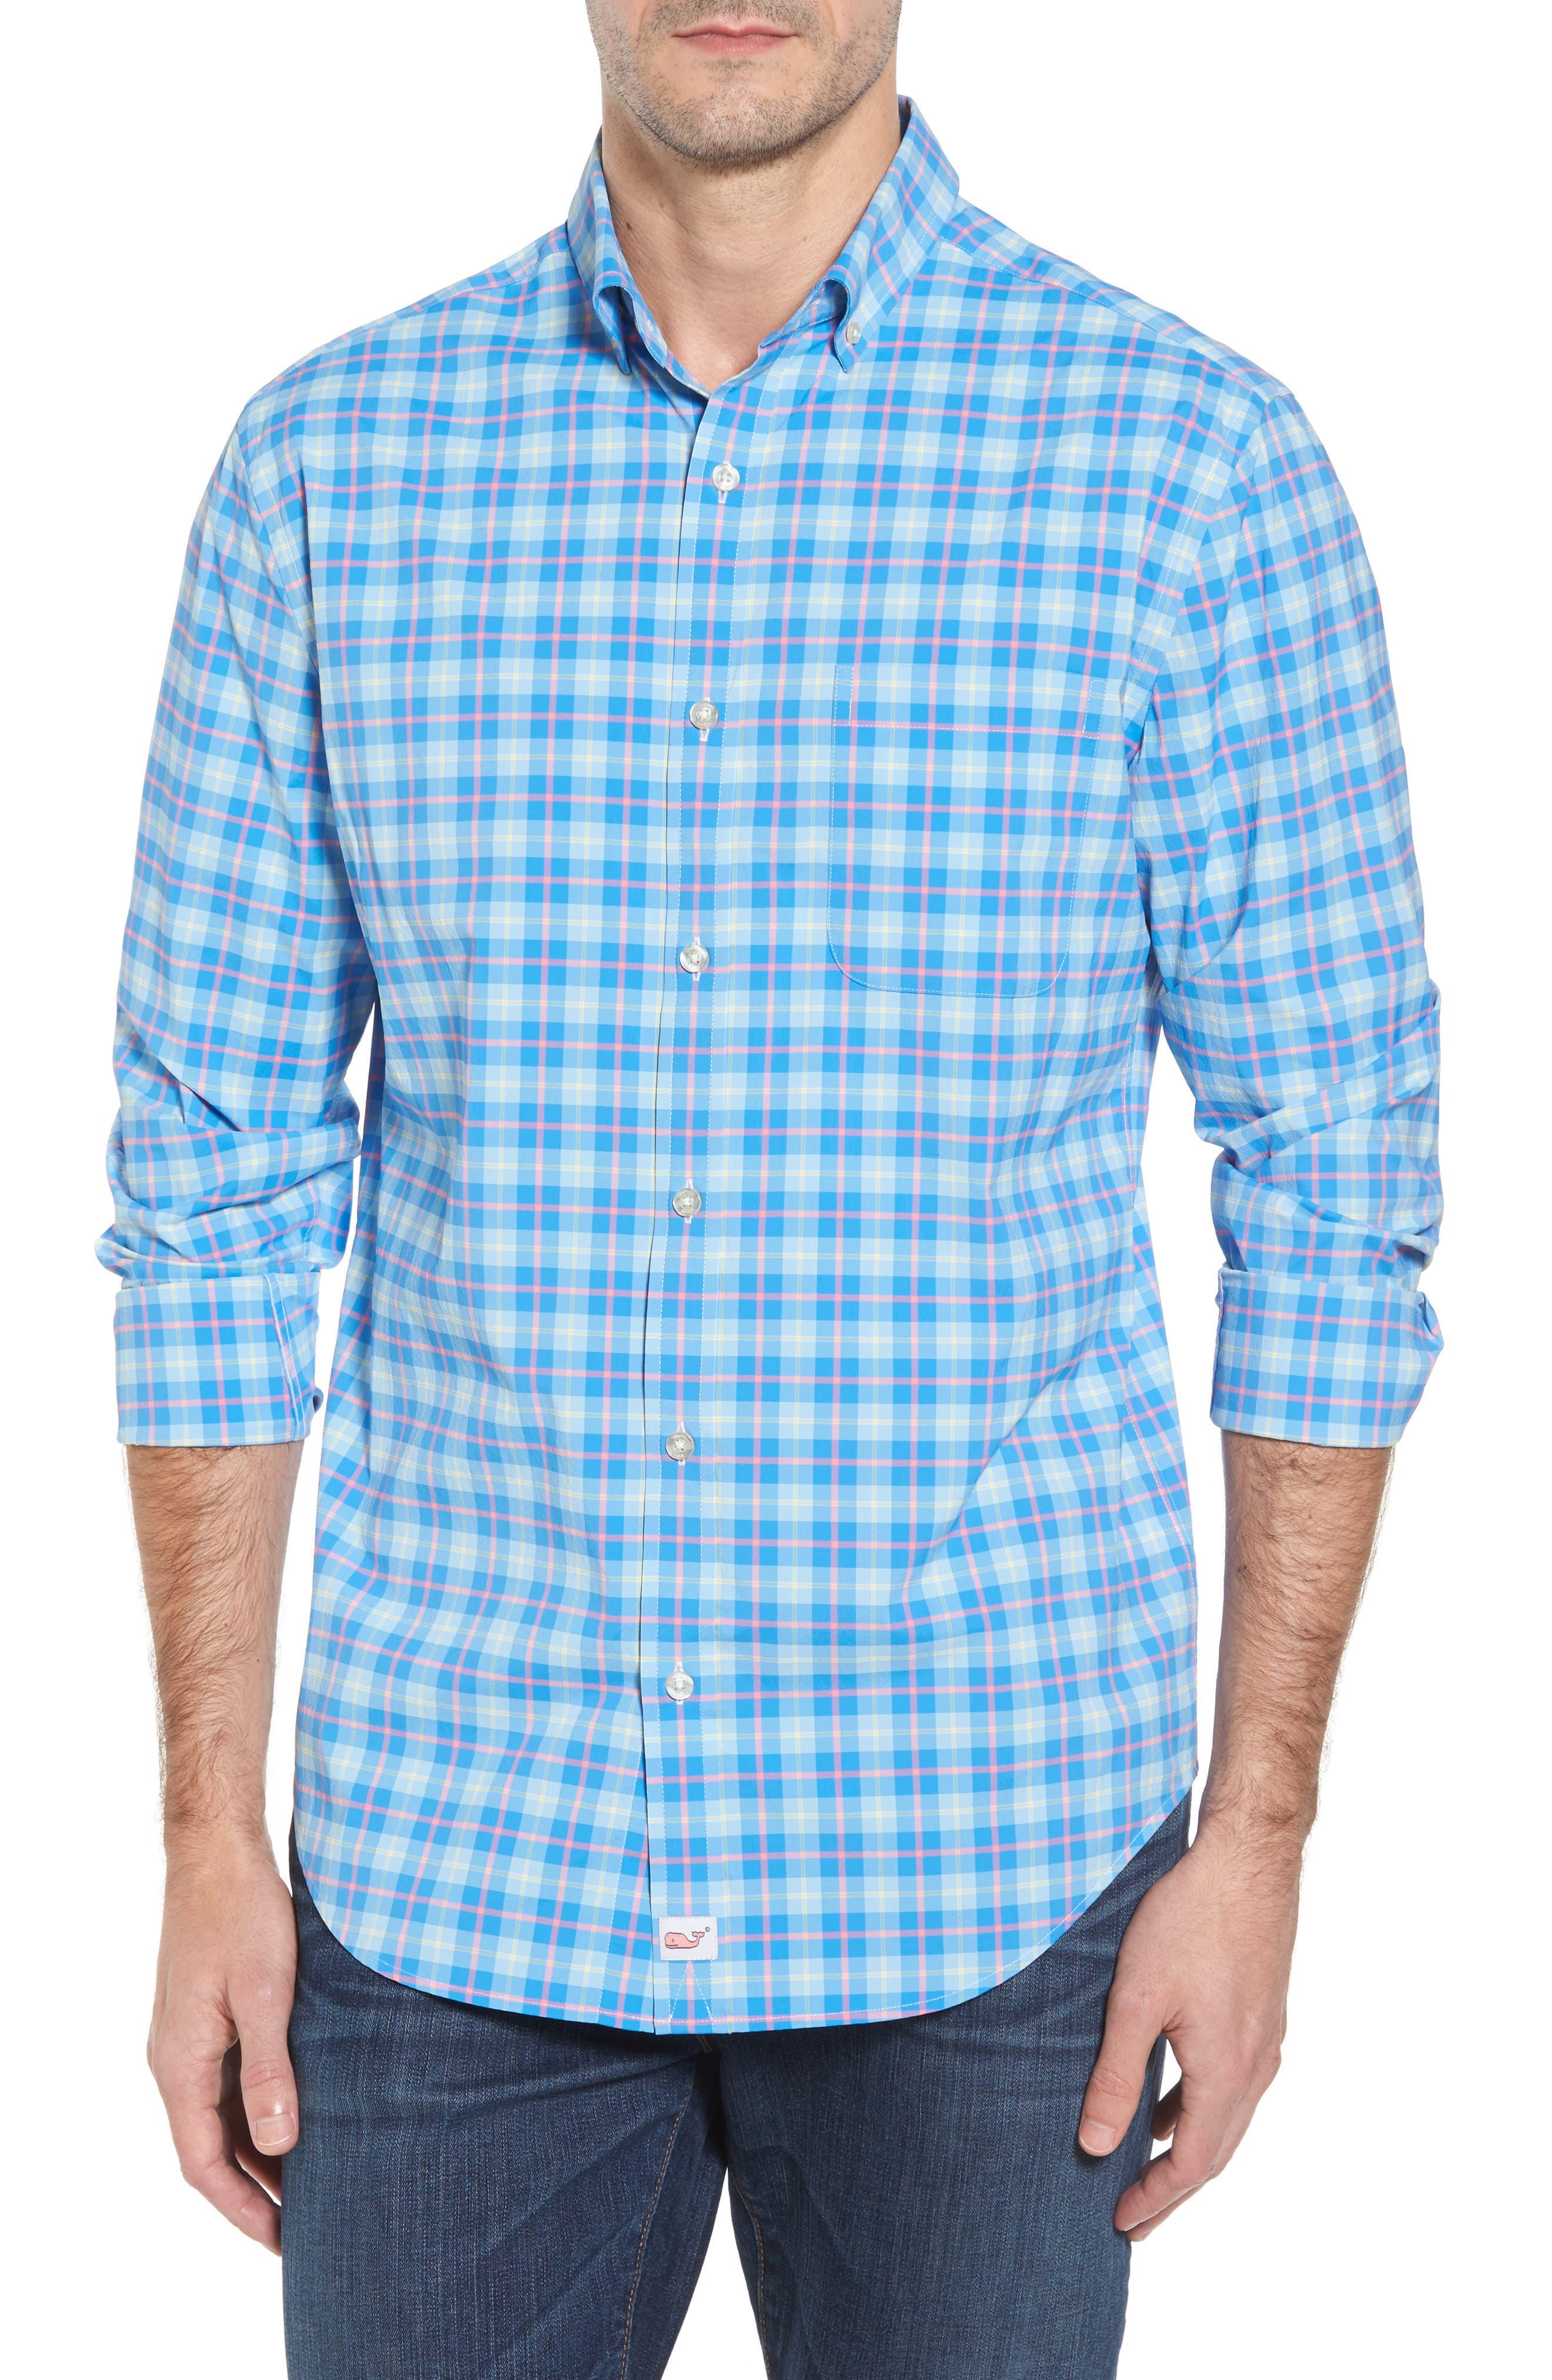 Alternate Image 1 Selected - vineyard vines Blue Heron Classic Fit Plaid Sport Shirt